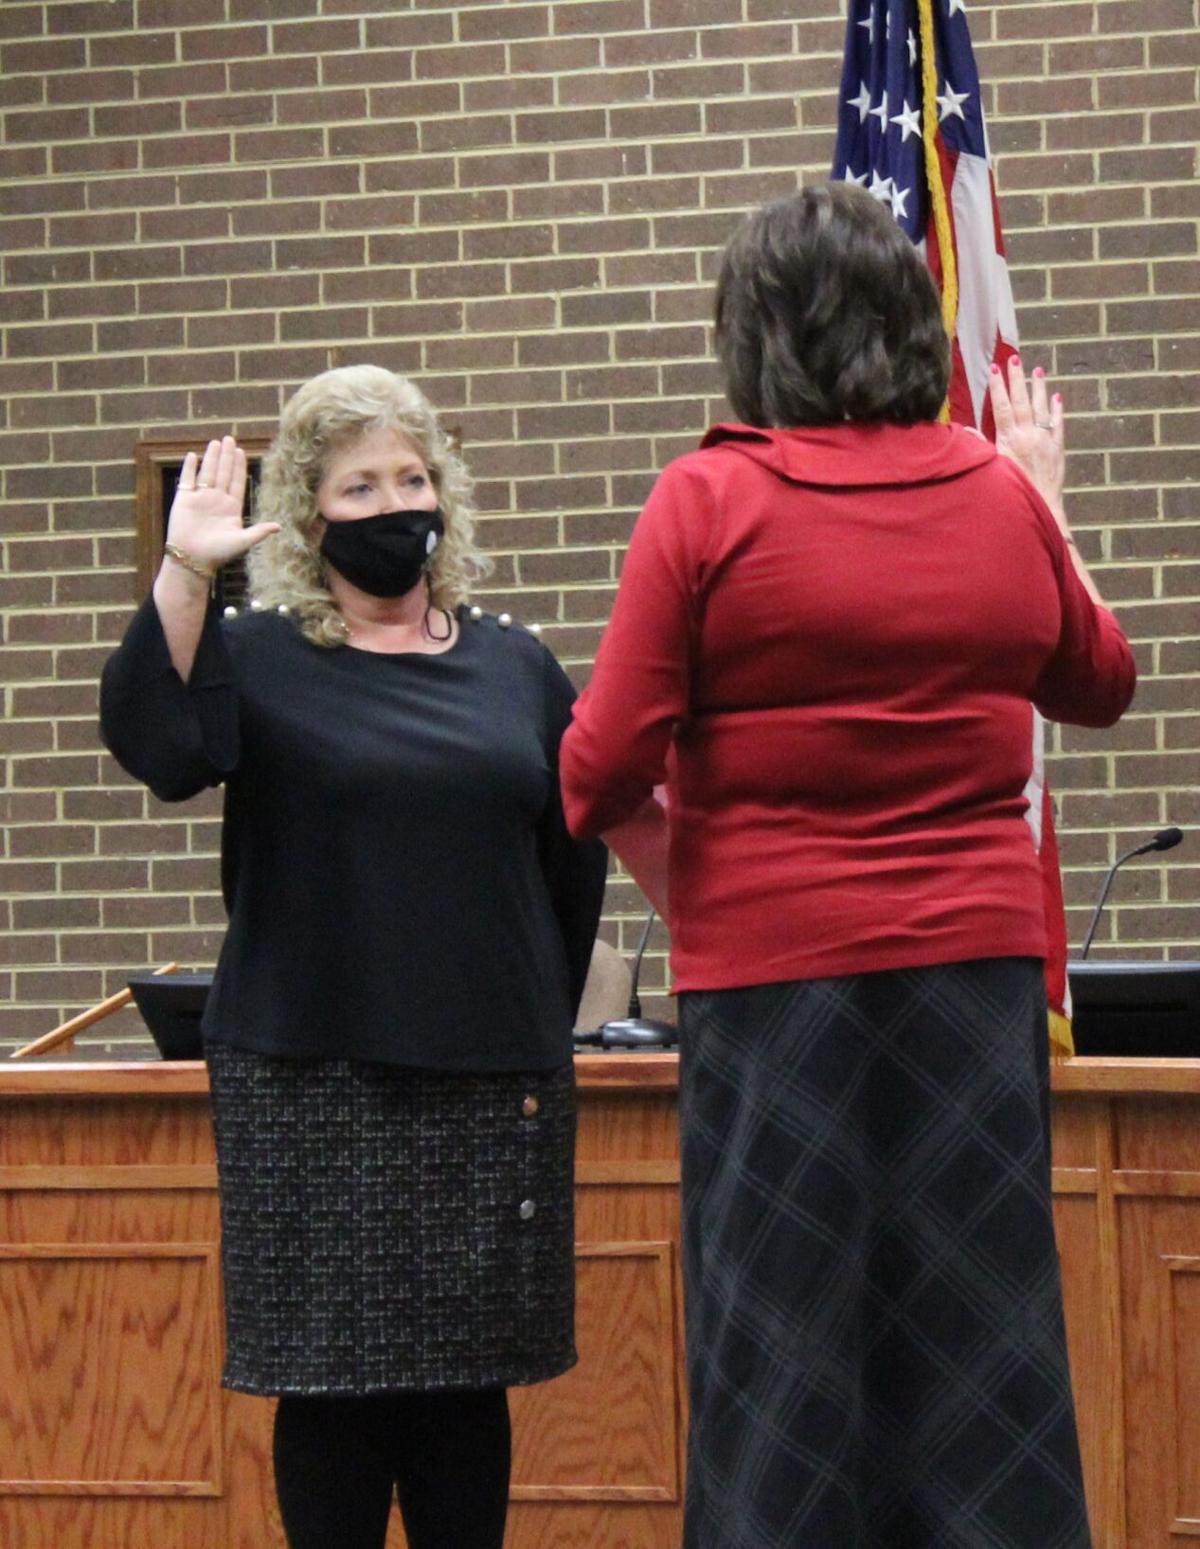 New Henry County Registrar